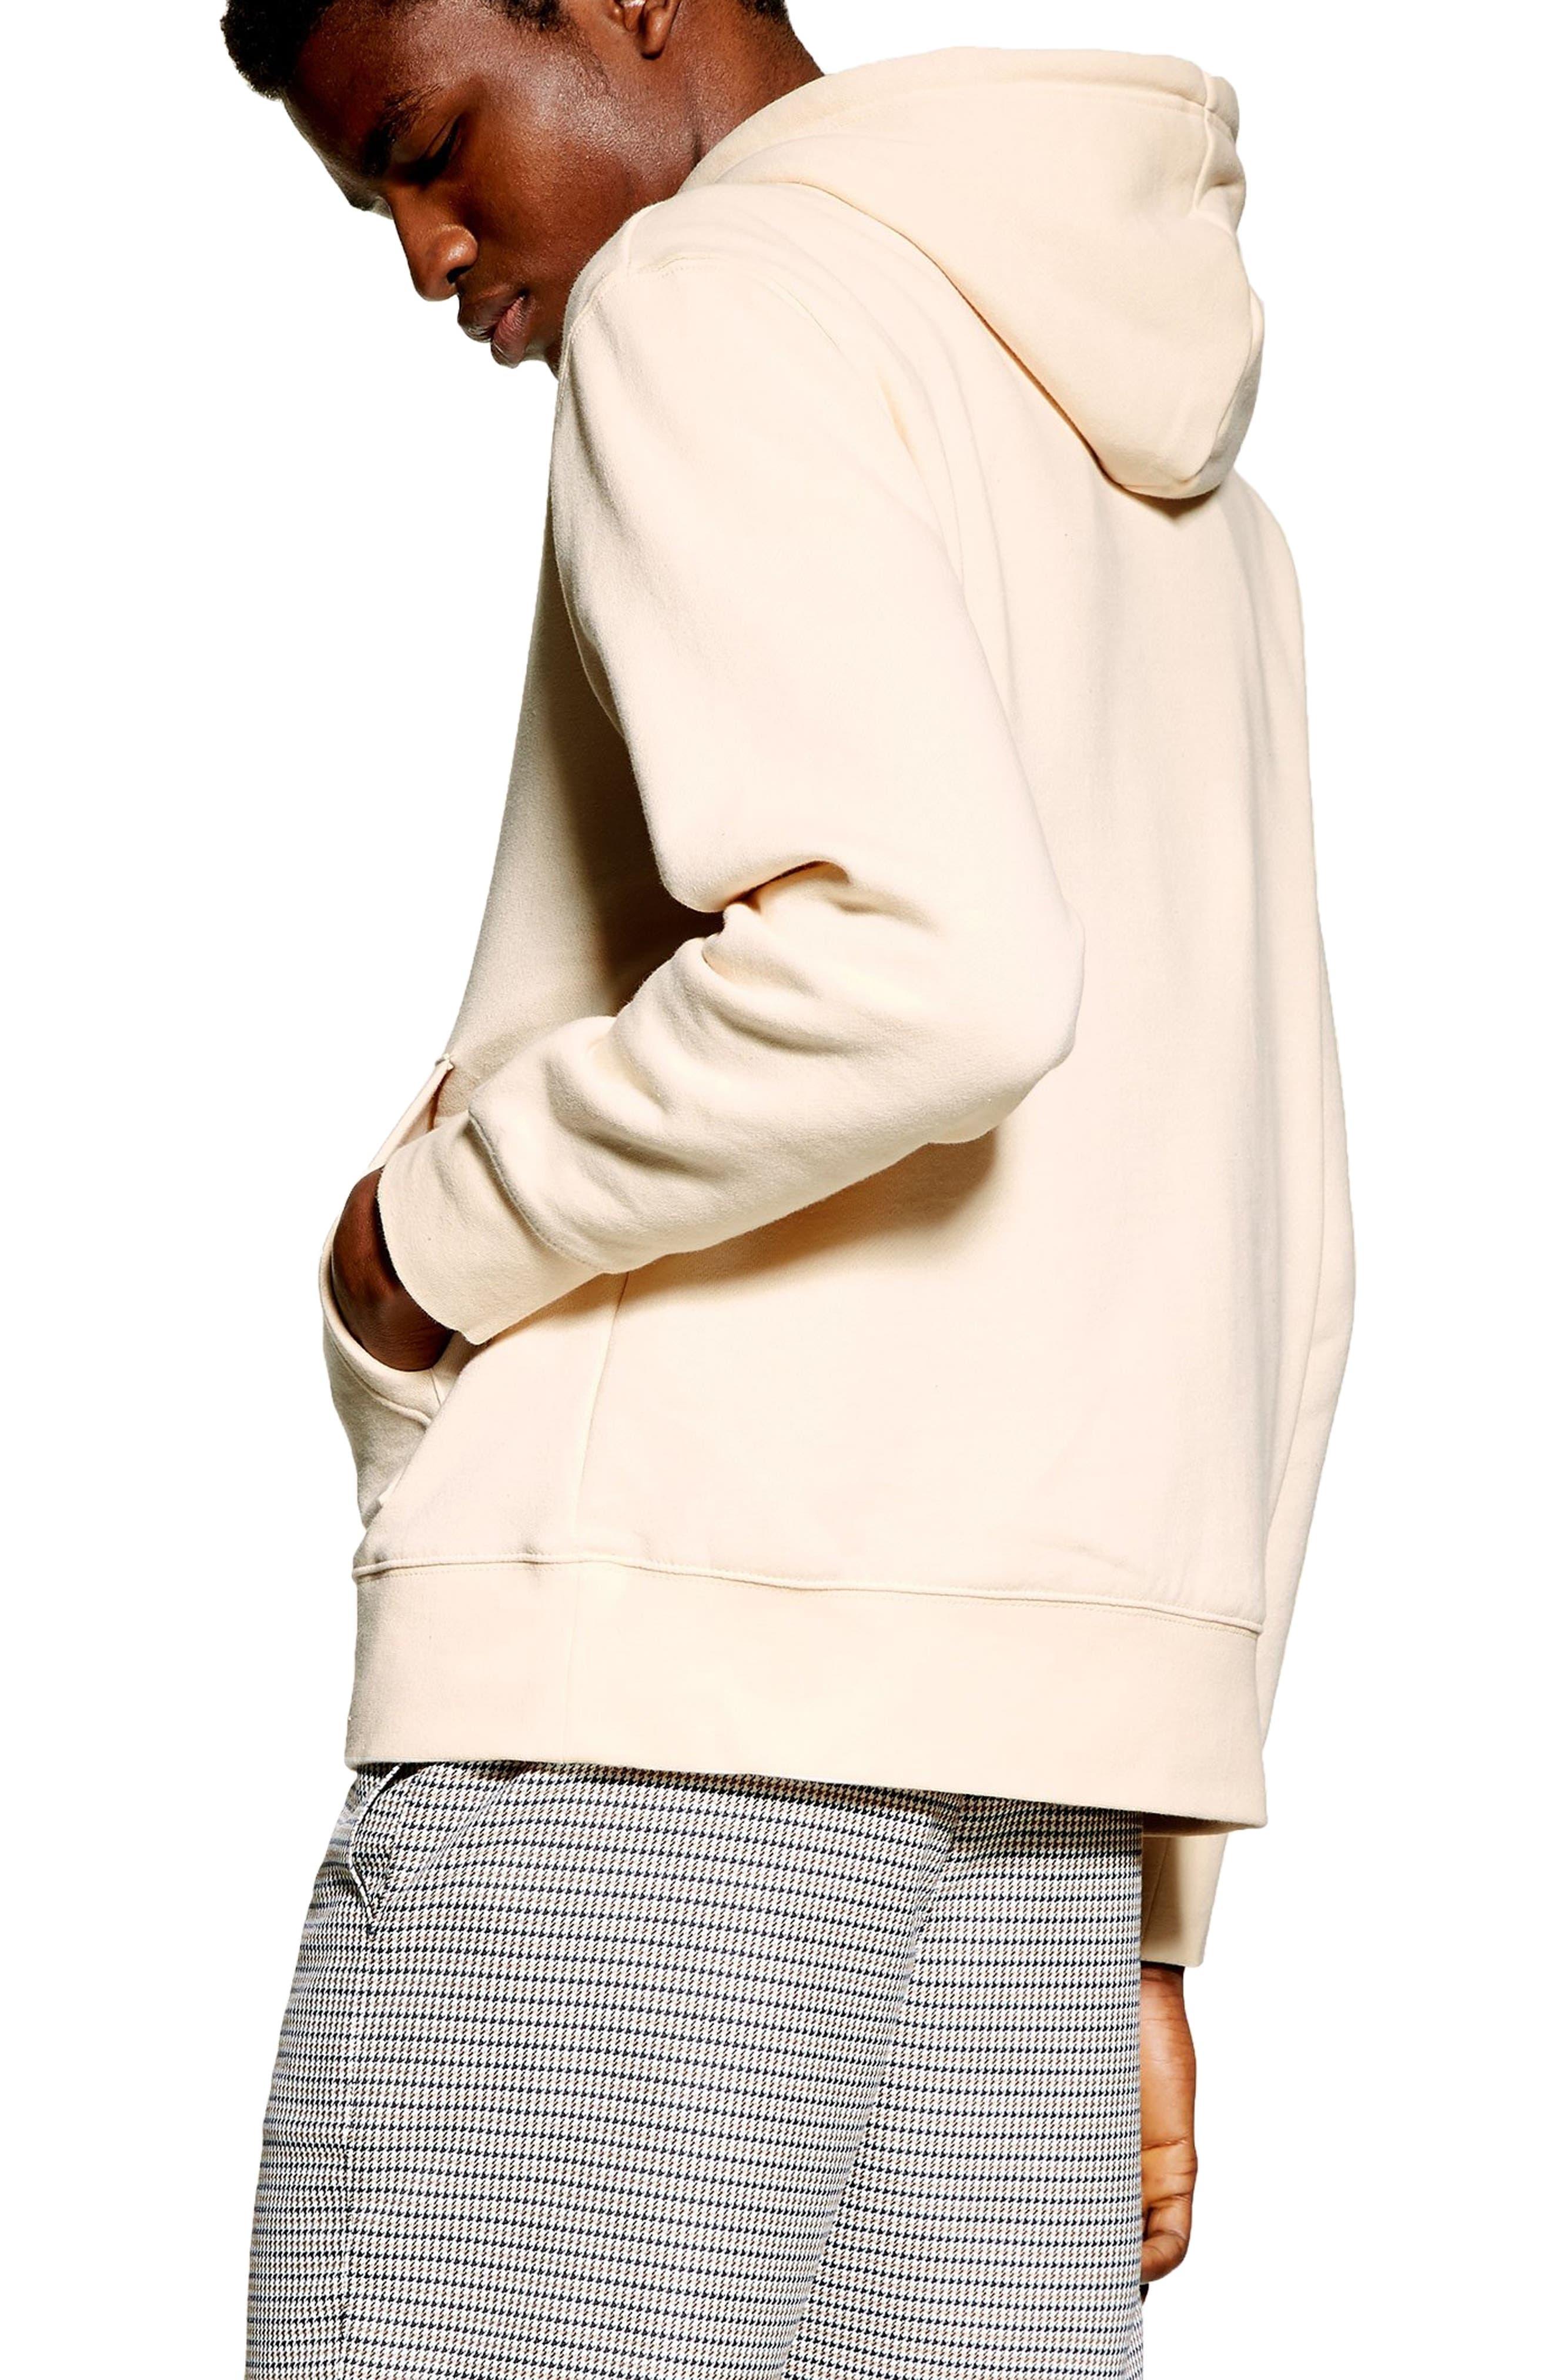 TOPMAN, Tristan Hooded Sweatshirt, Alternate thumbnail 2, color, STONE